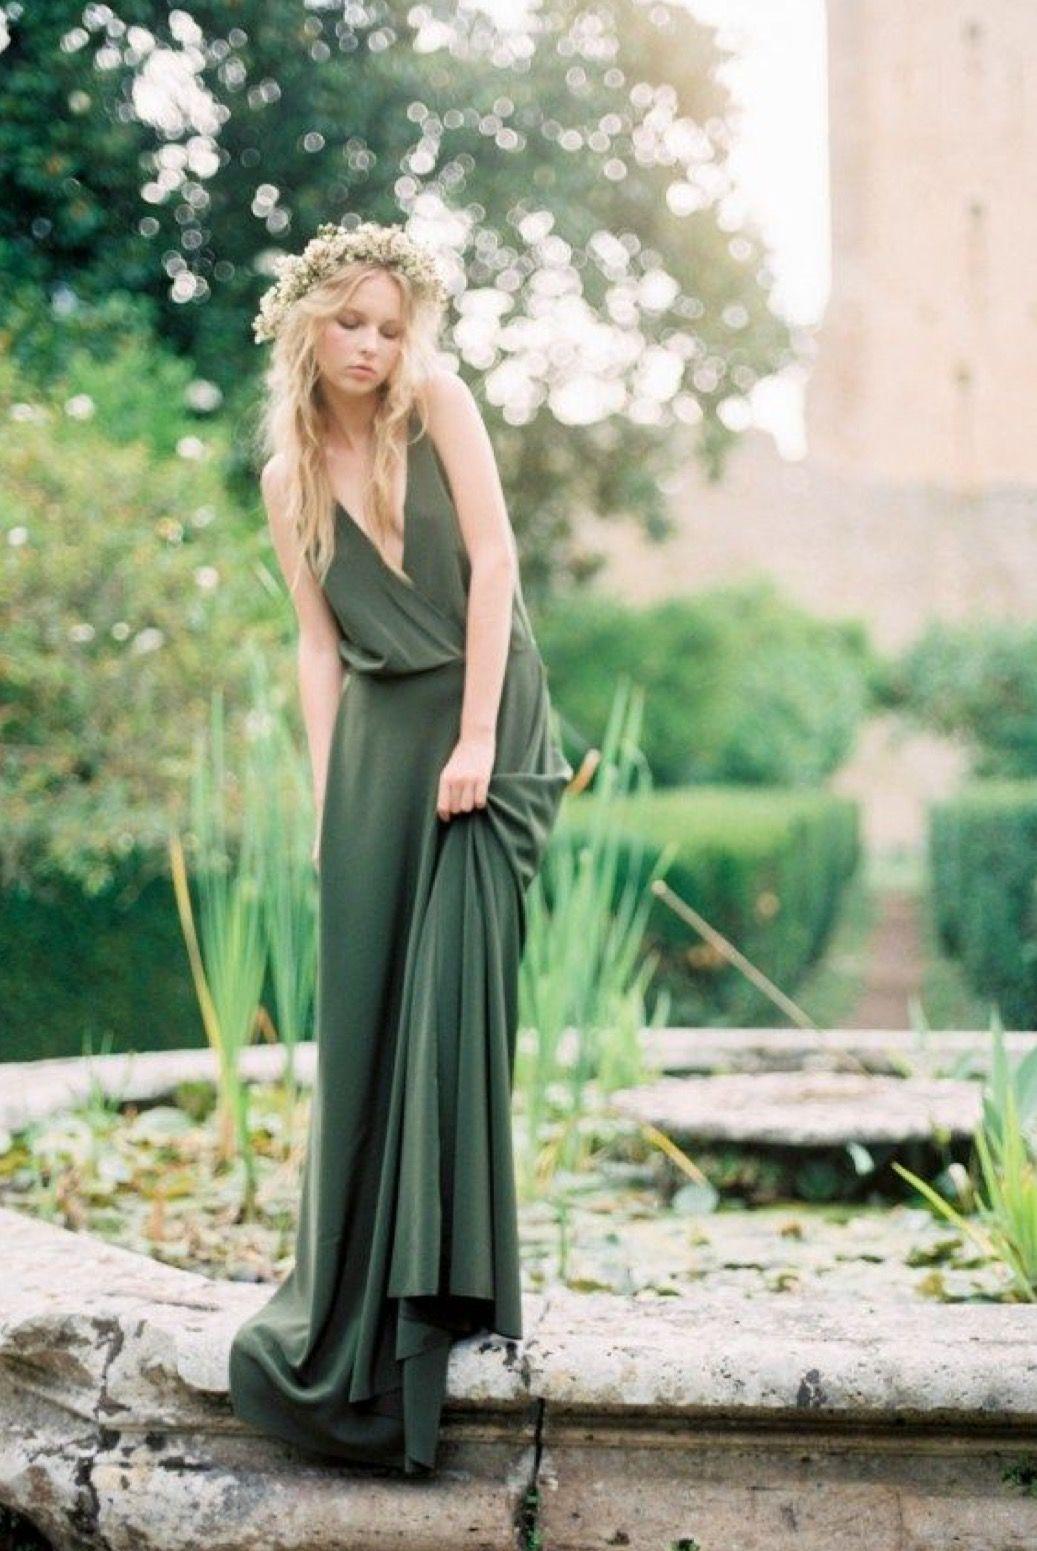 Green dress for wedding  Lovely green boho dress  Wedding ideas  Pinterest  Boho Wedding